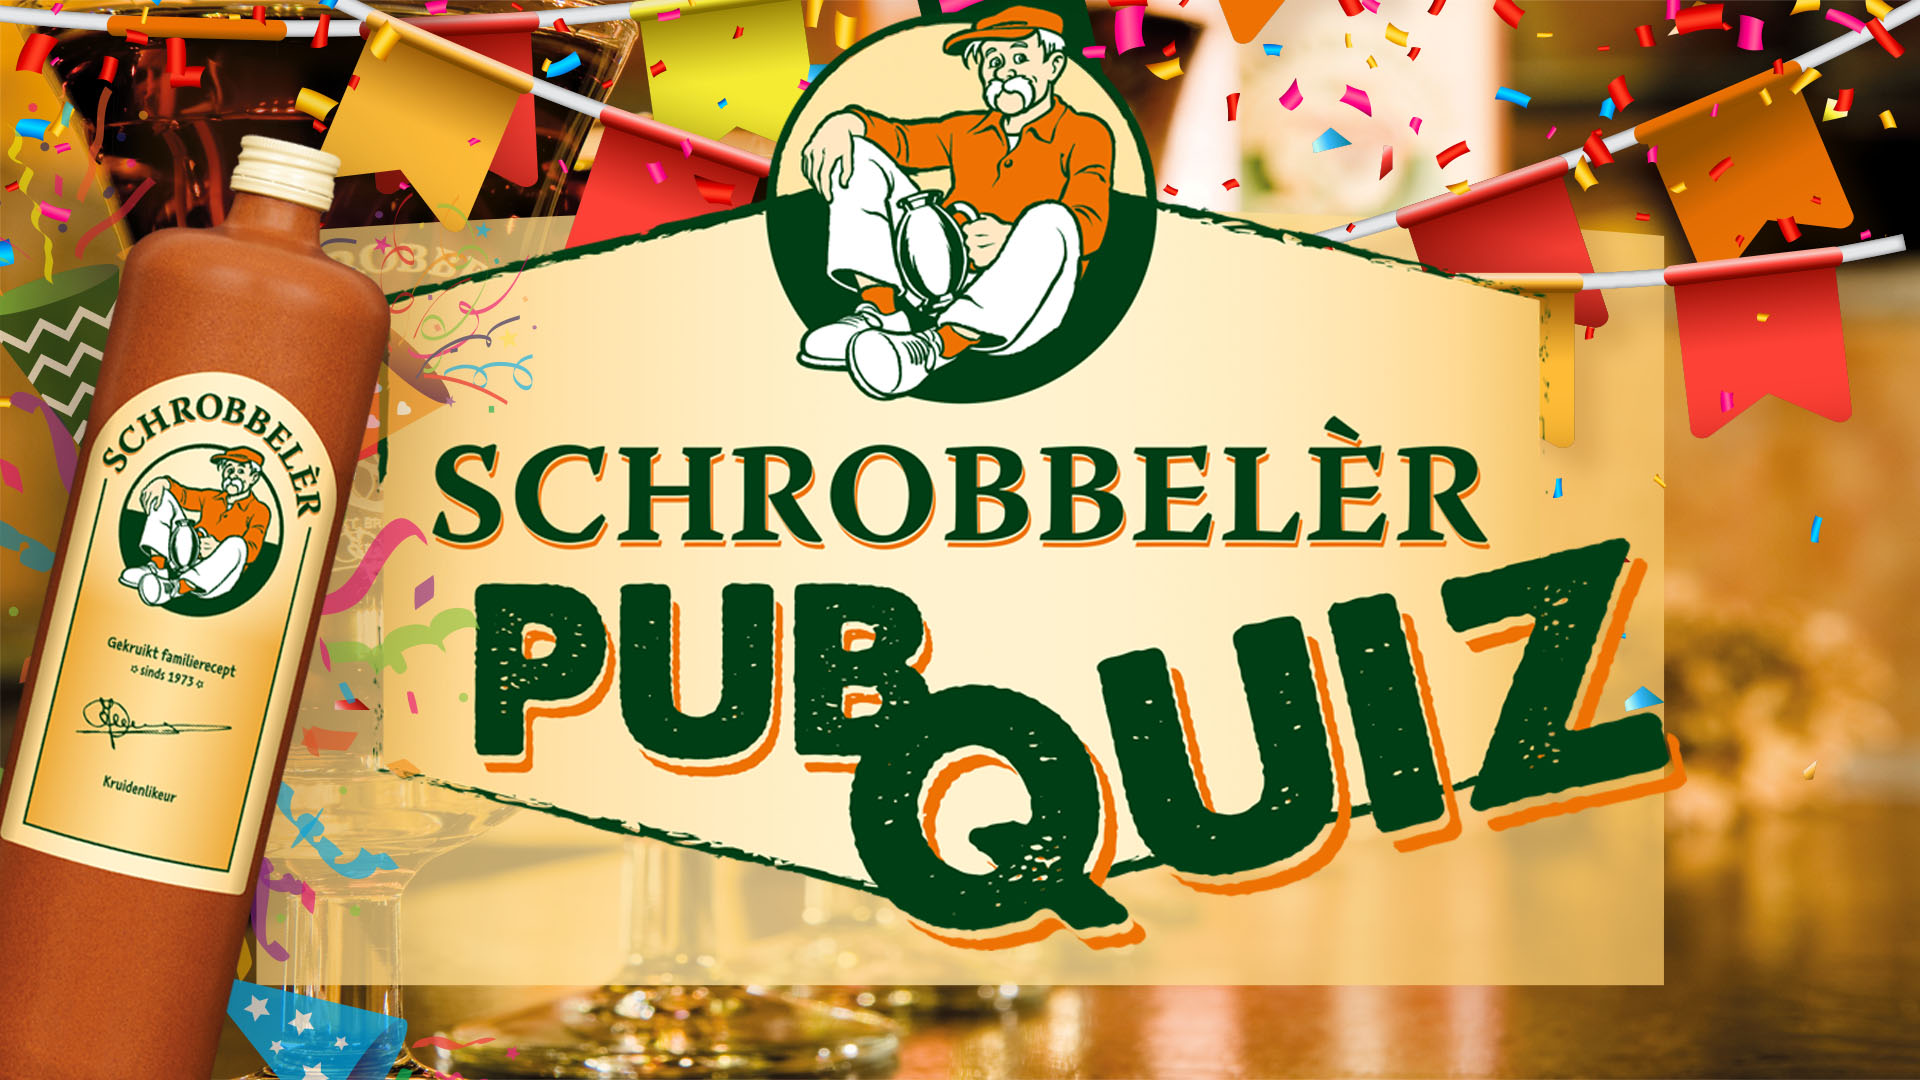 Schrobbeler Pub Quiz